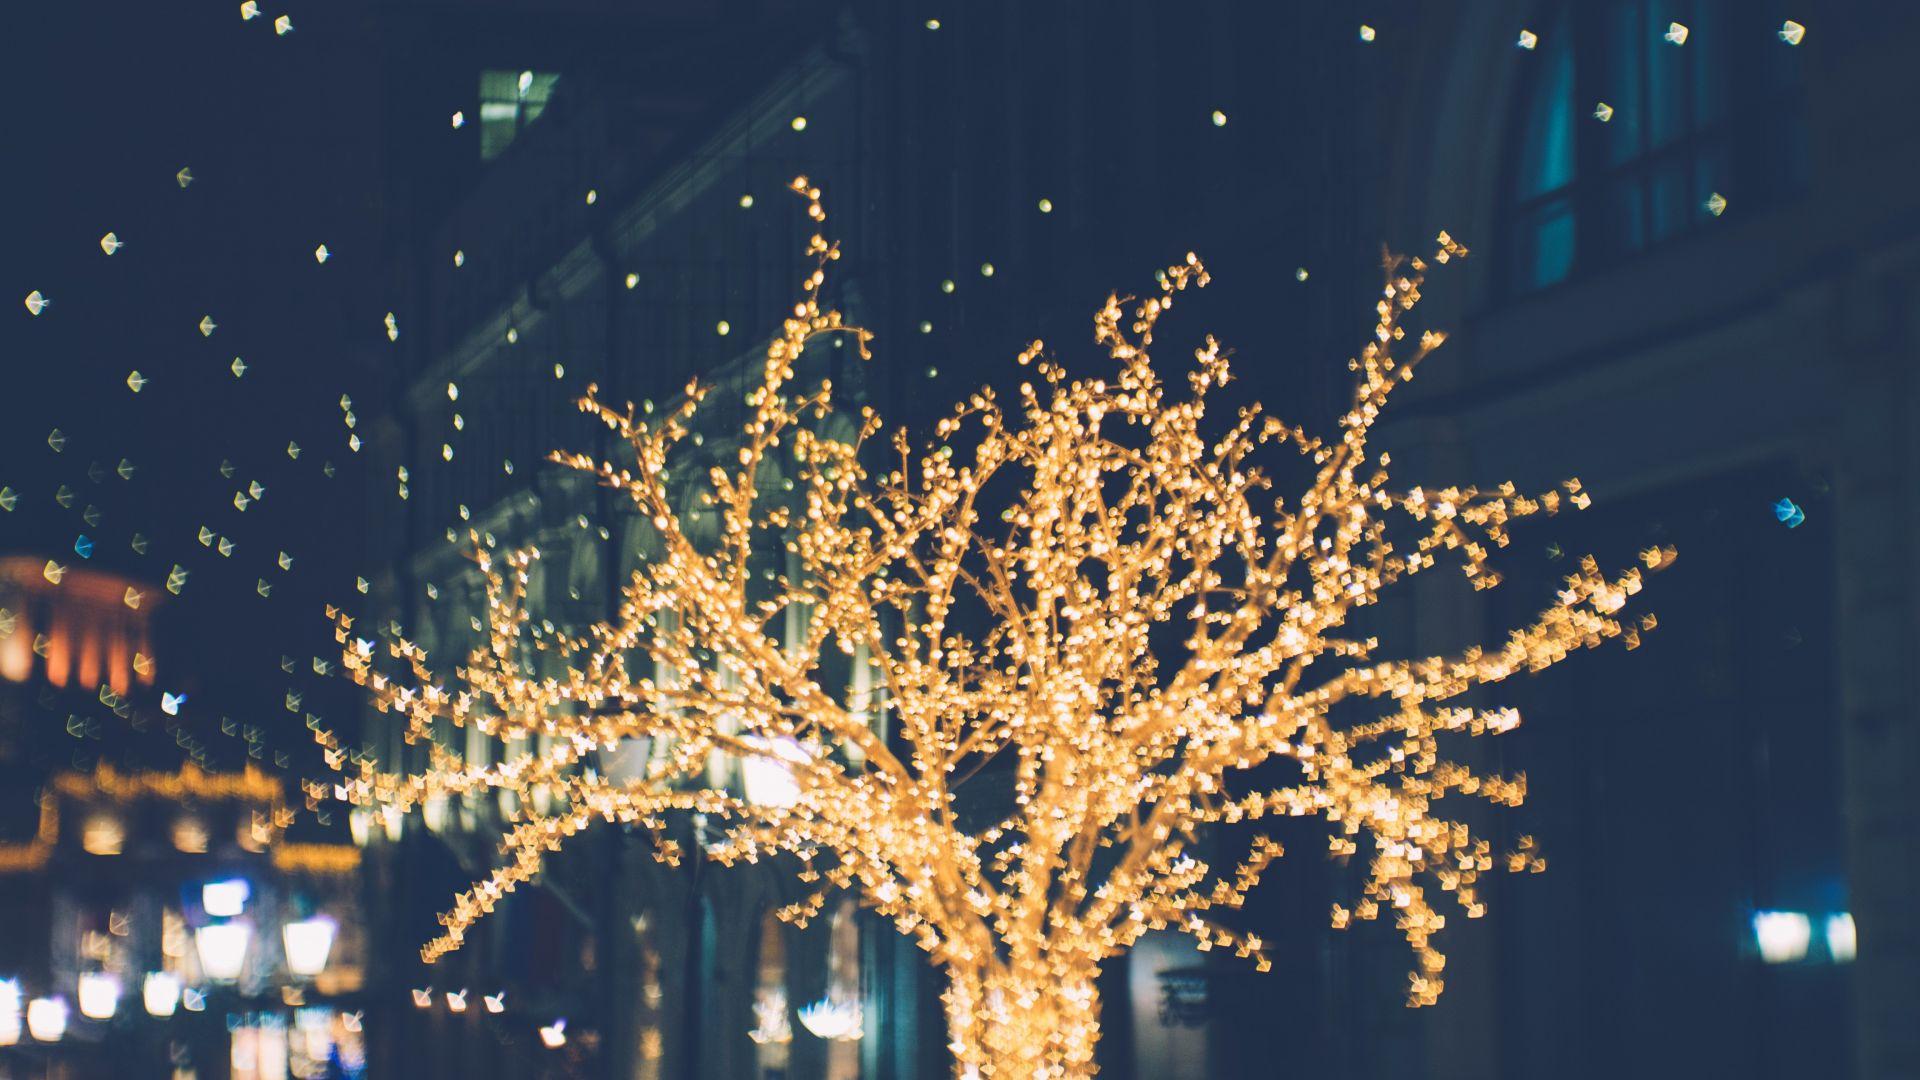 Wallpaper Decorations, lights, night